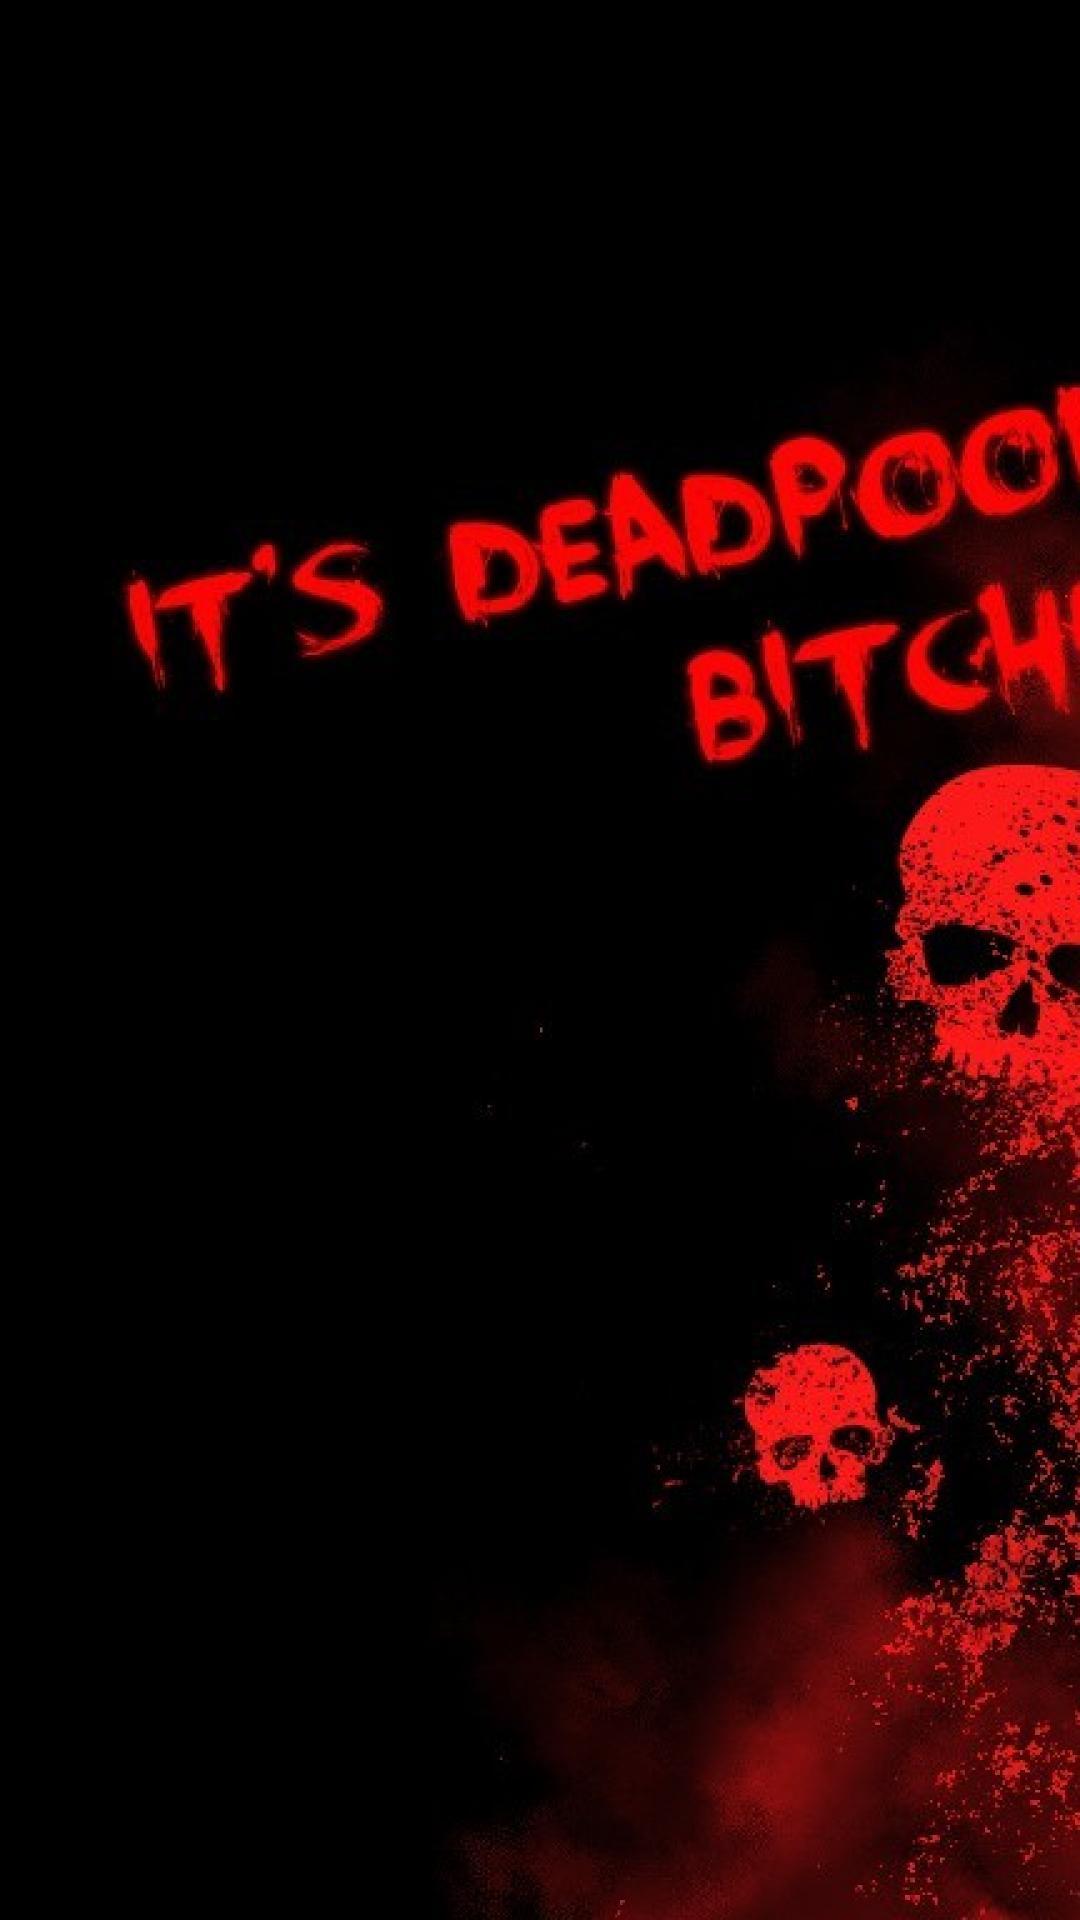 Black Background Deadpool Wallpaper Iphone Wallpaper